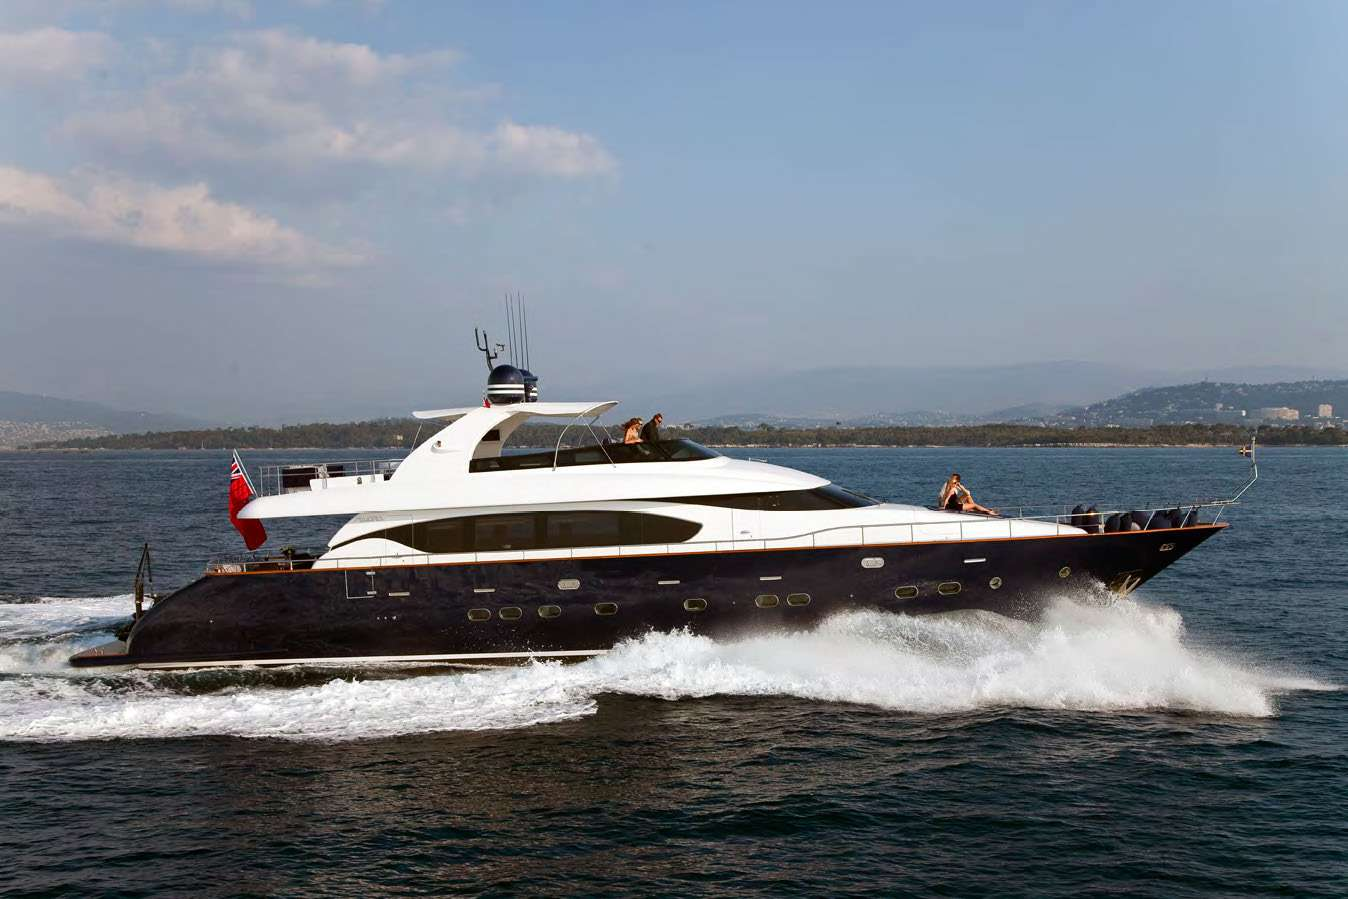 Main image of ASHA yacht